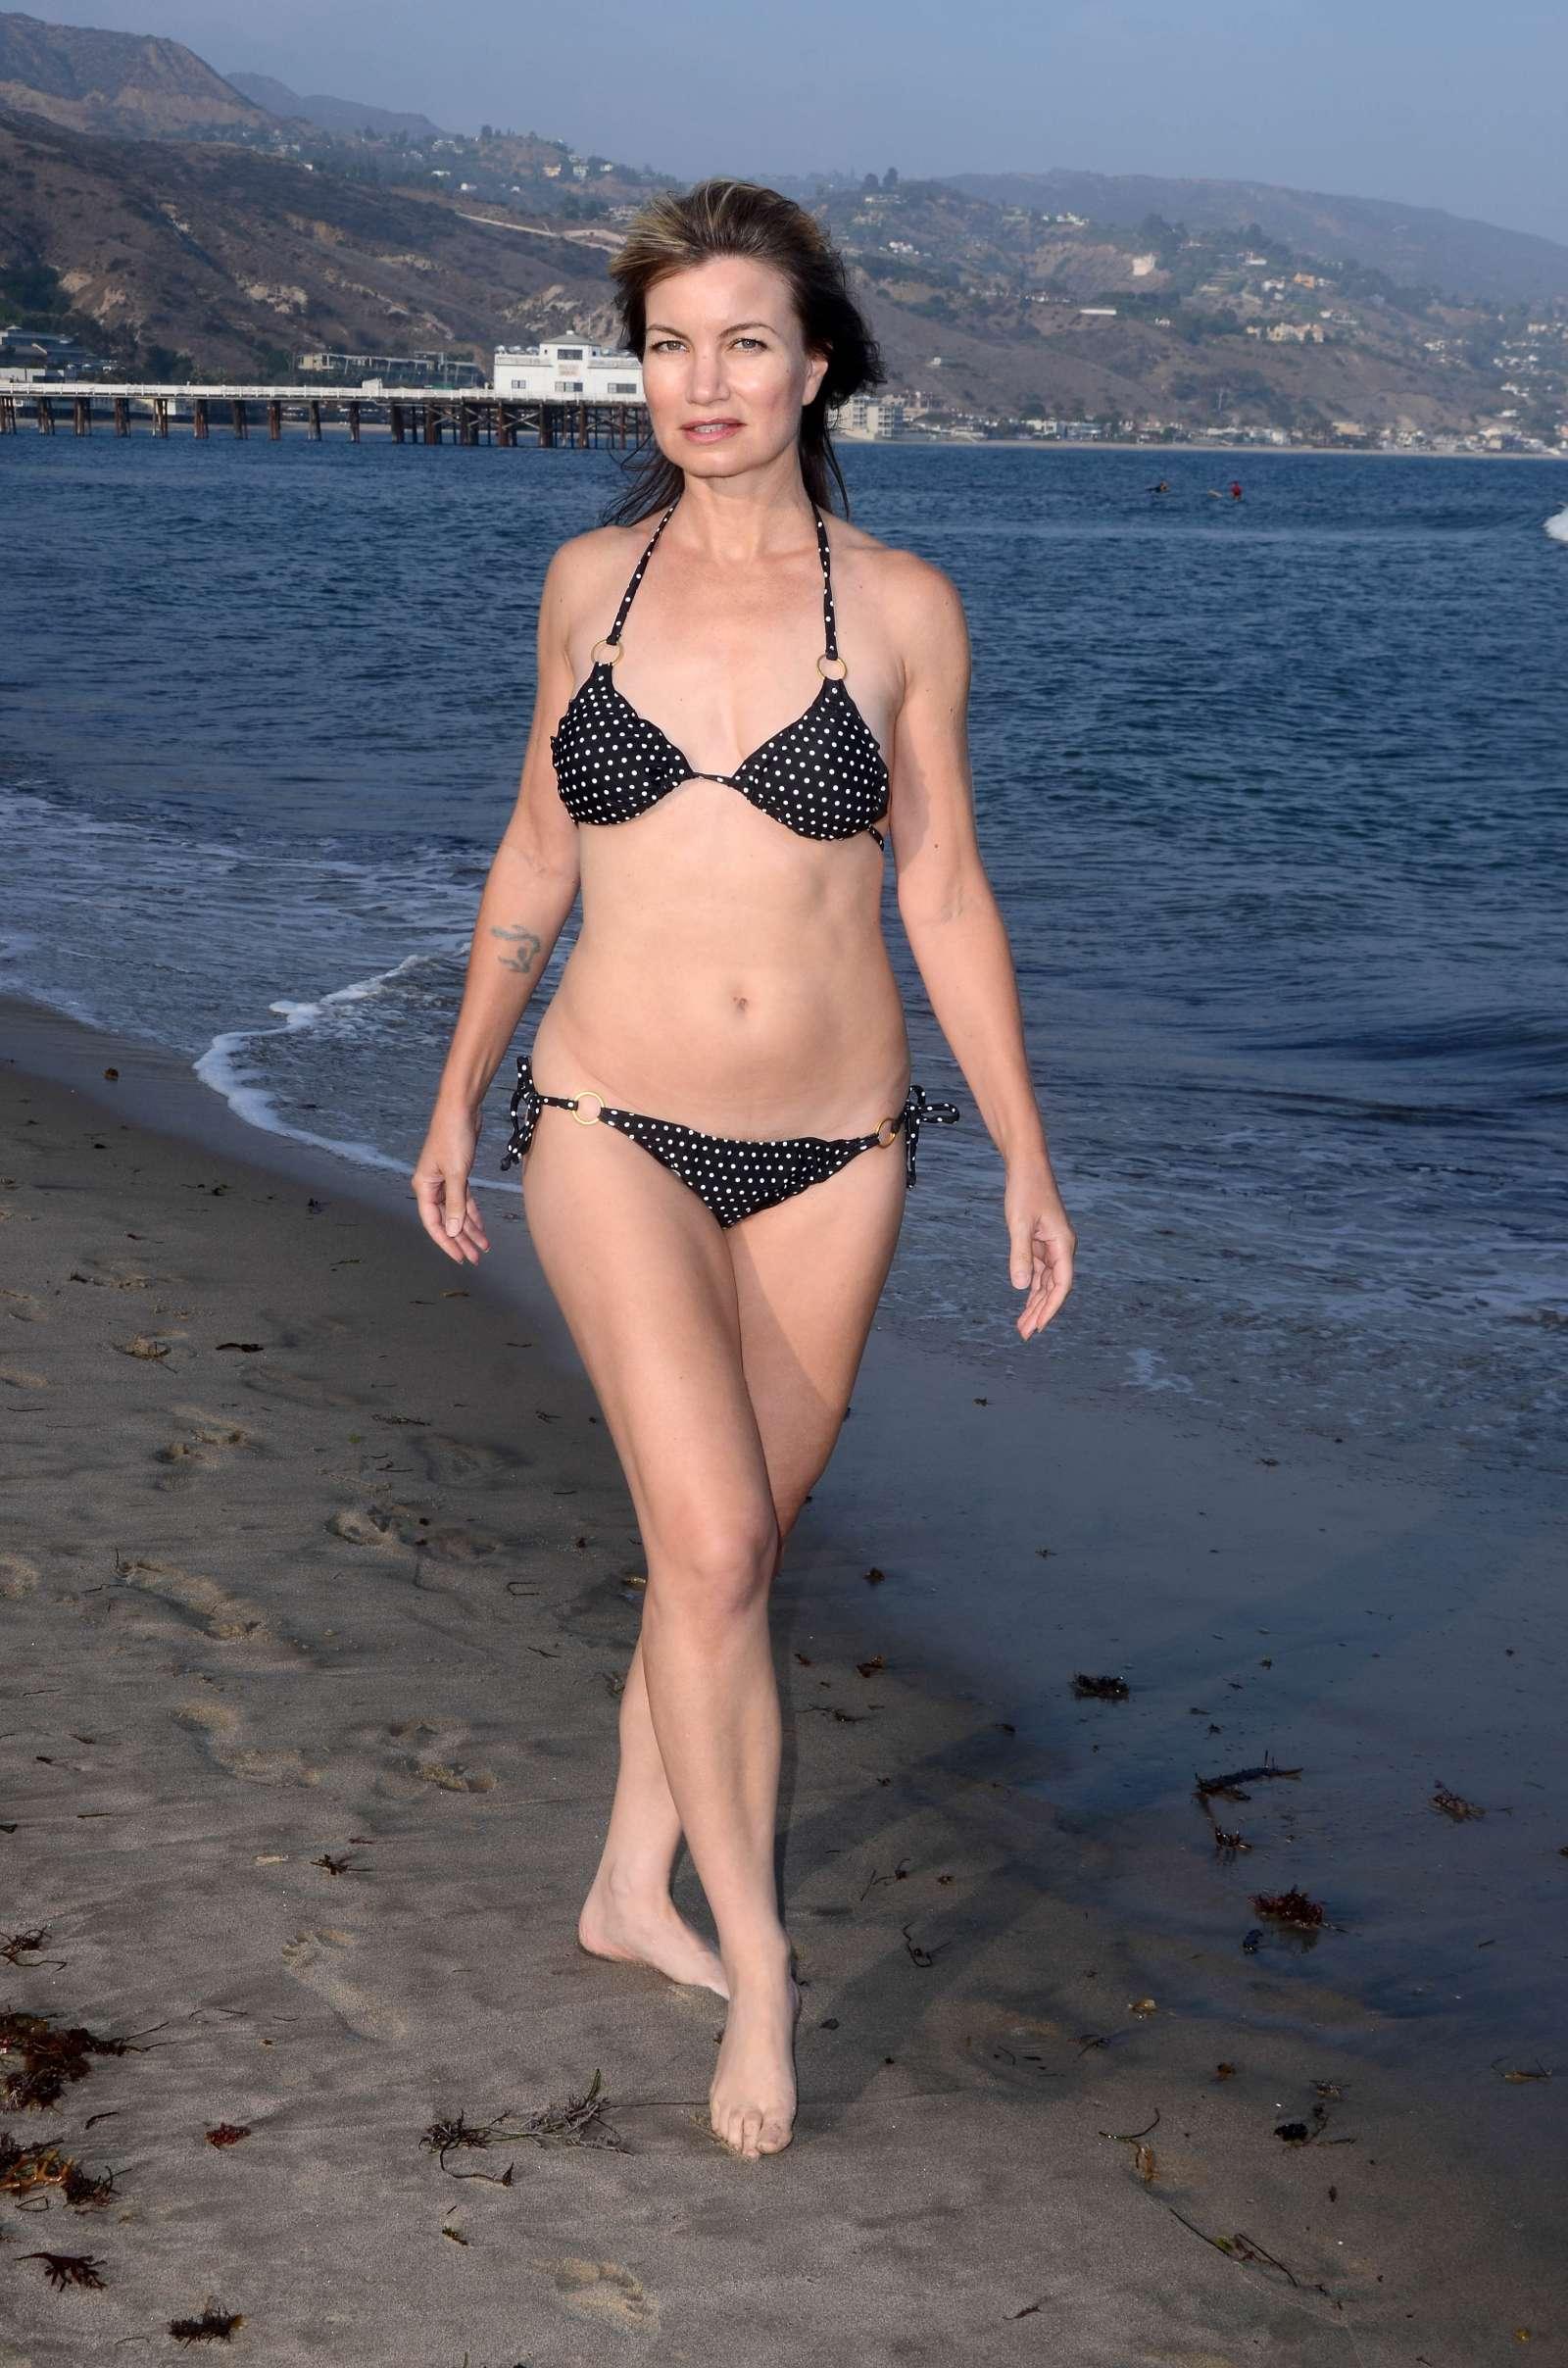 Leaked Rena Riffel nude photos 2019